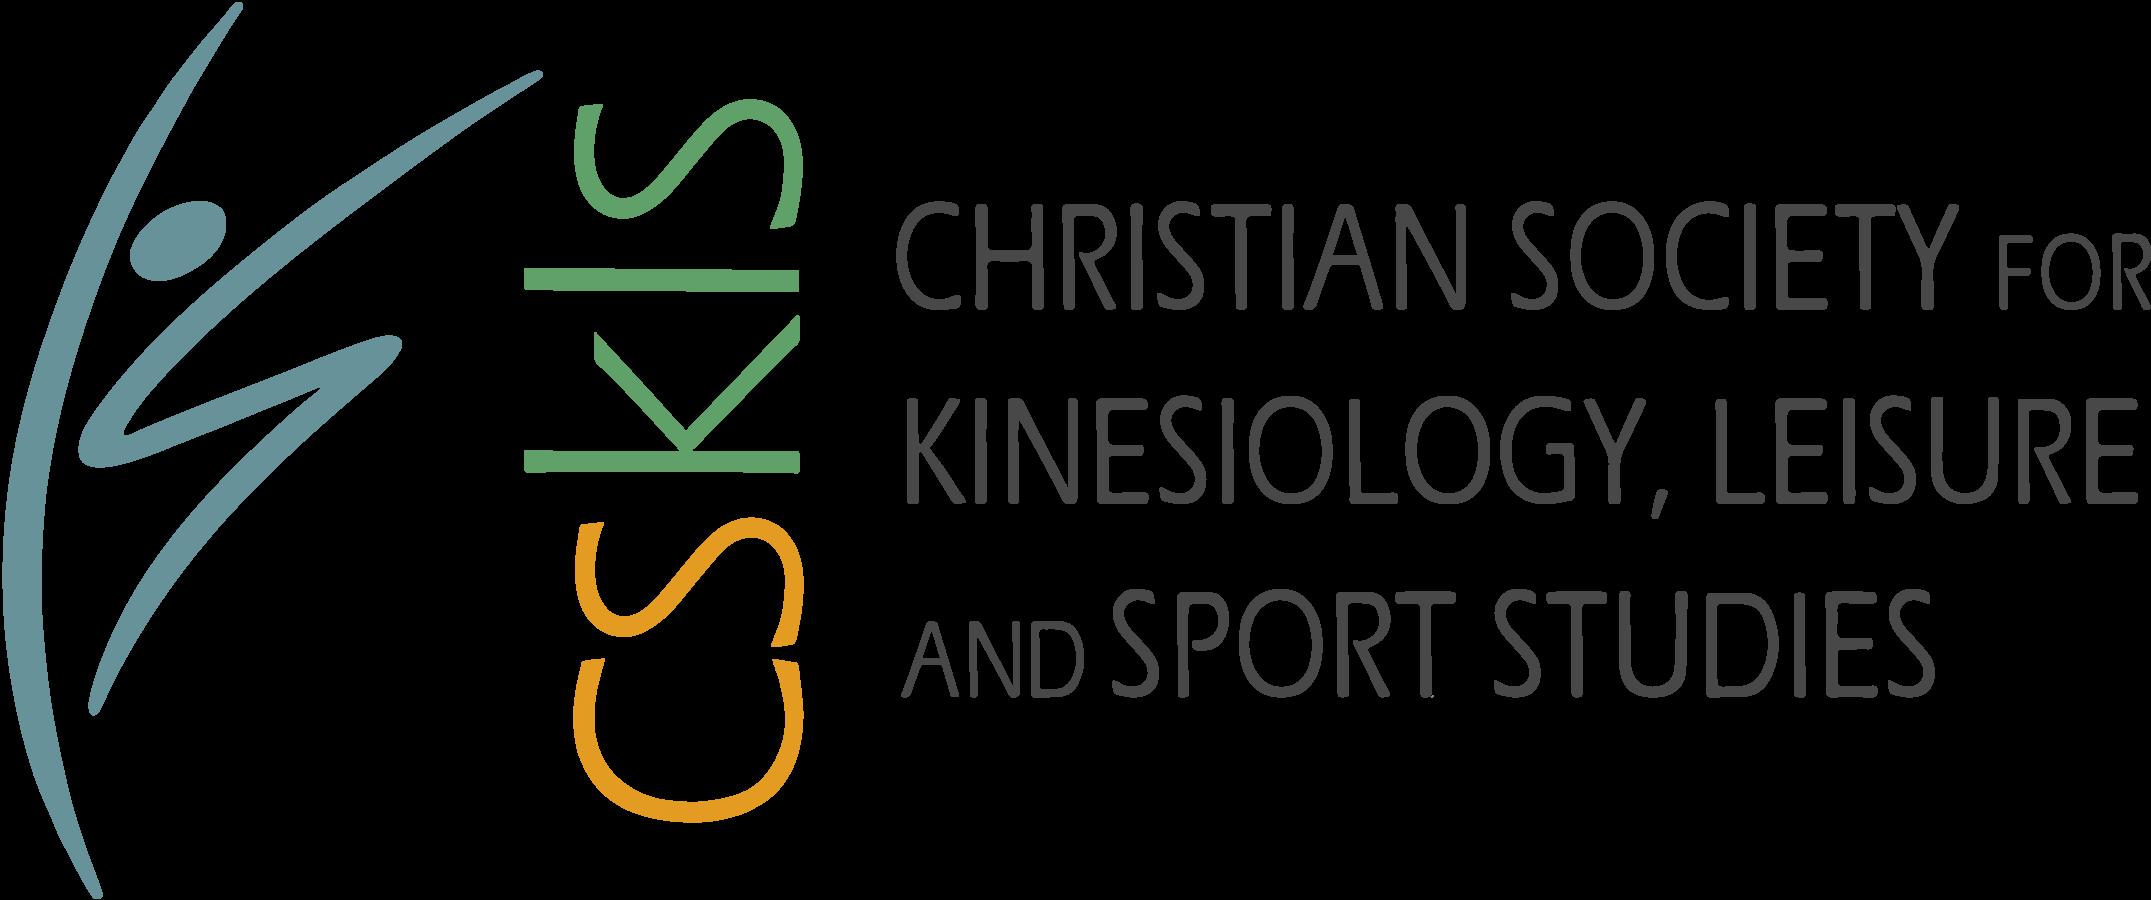 Christian Society for Kinesiology, Leisure & Sport Studies